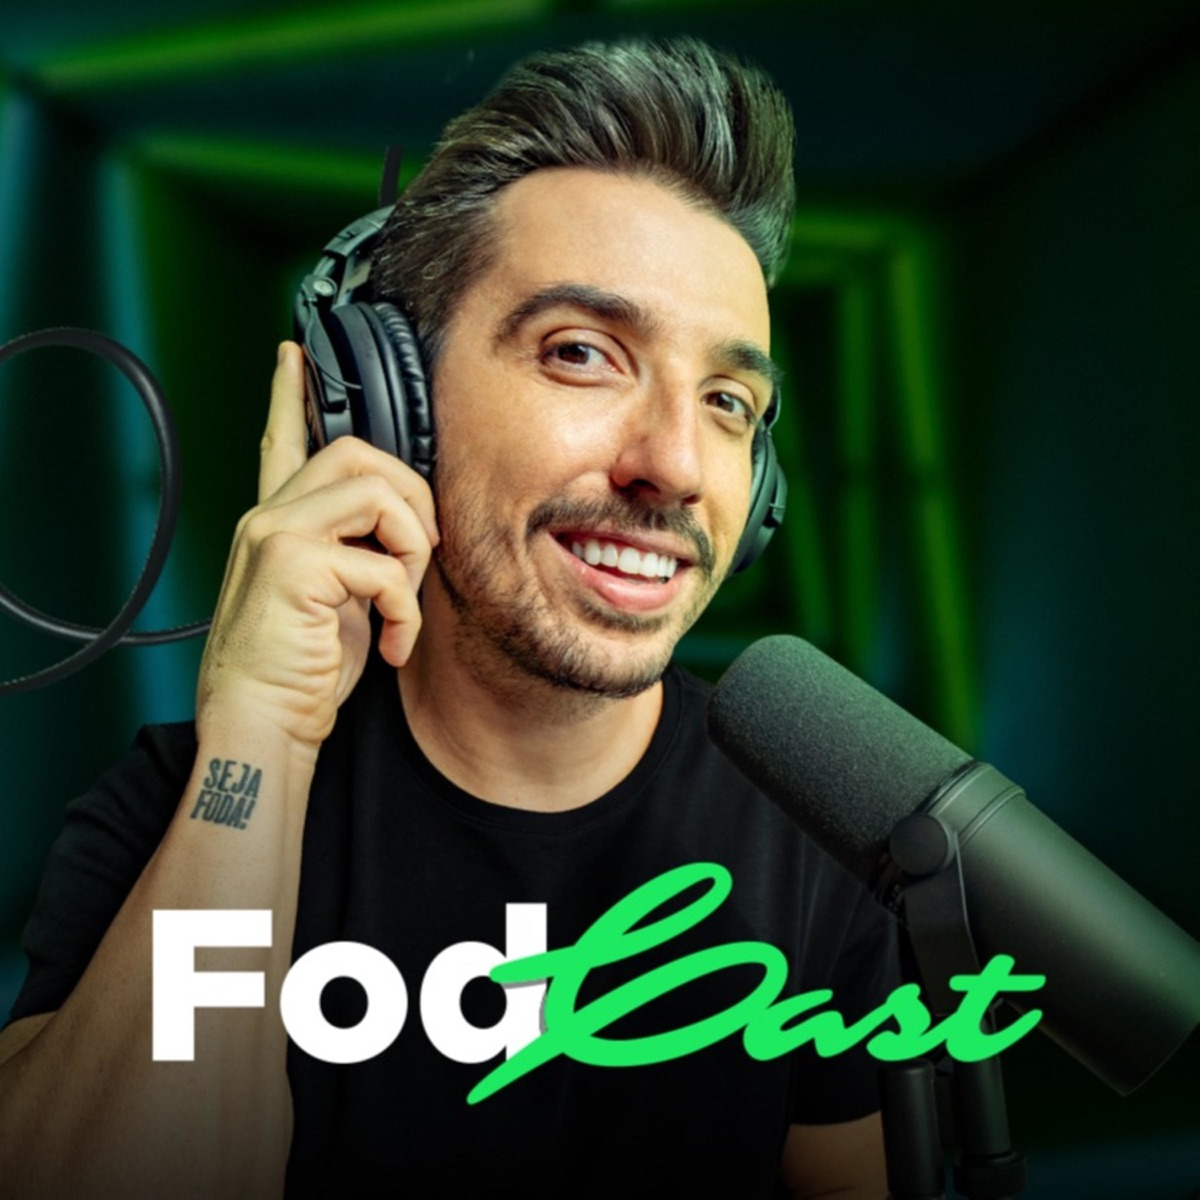 FodCast